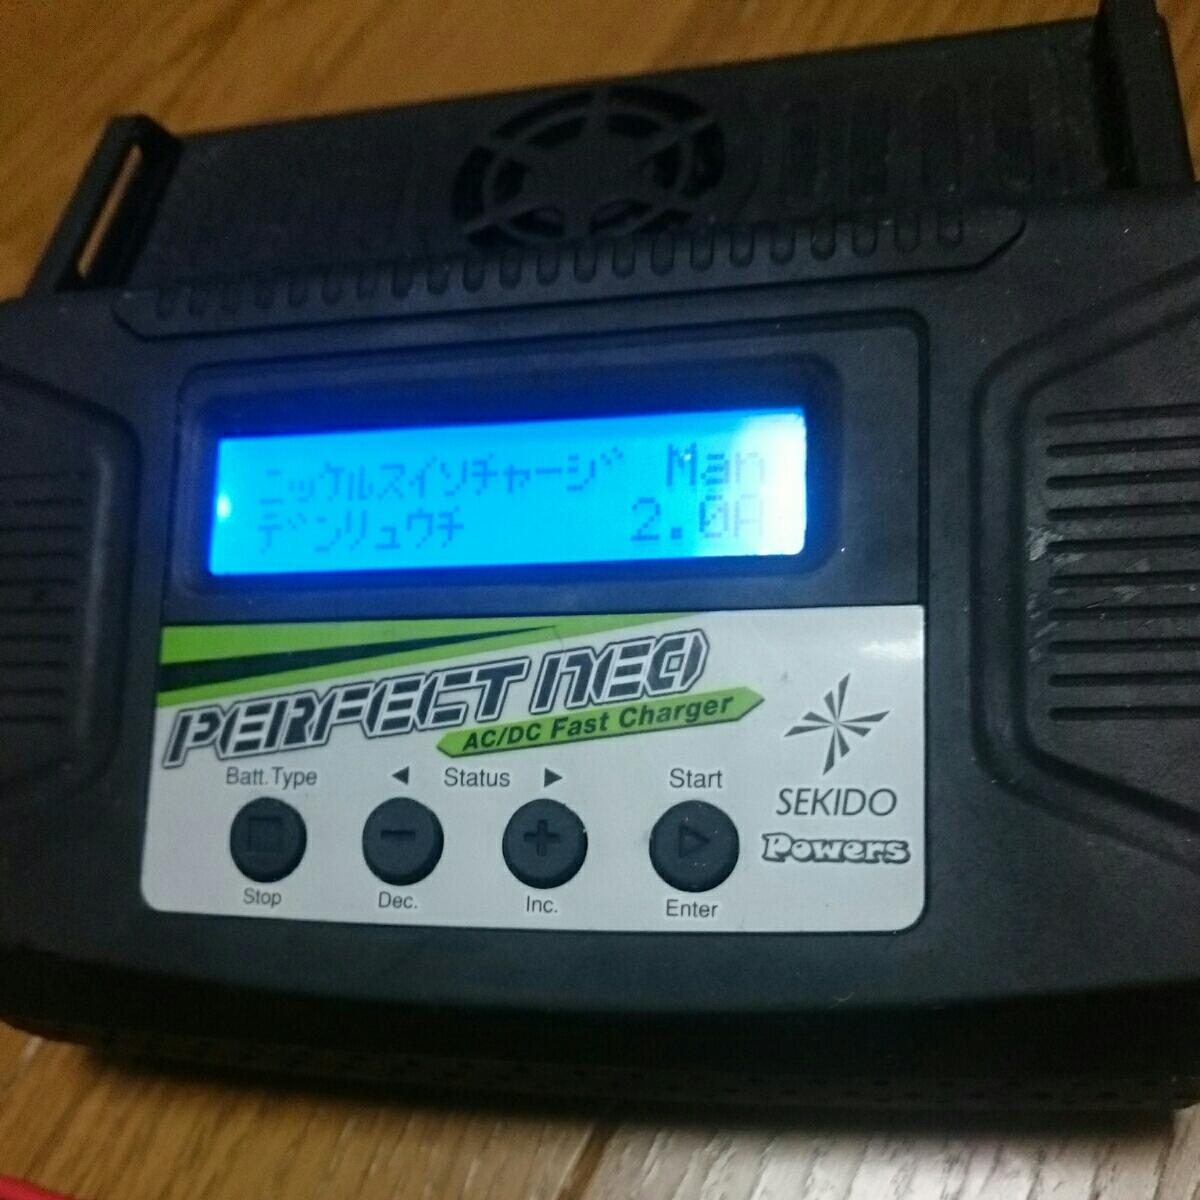 Powers パーフェクト ネオ 急速充電器 動作OK ジャンク / リポ、リフェ、ニカド、ニッケル水素_画像2